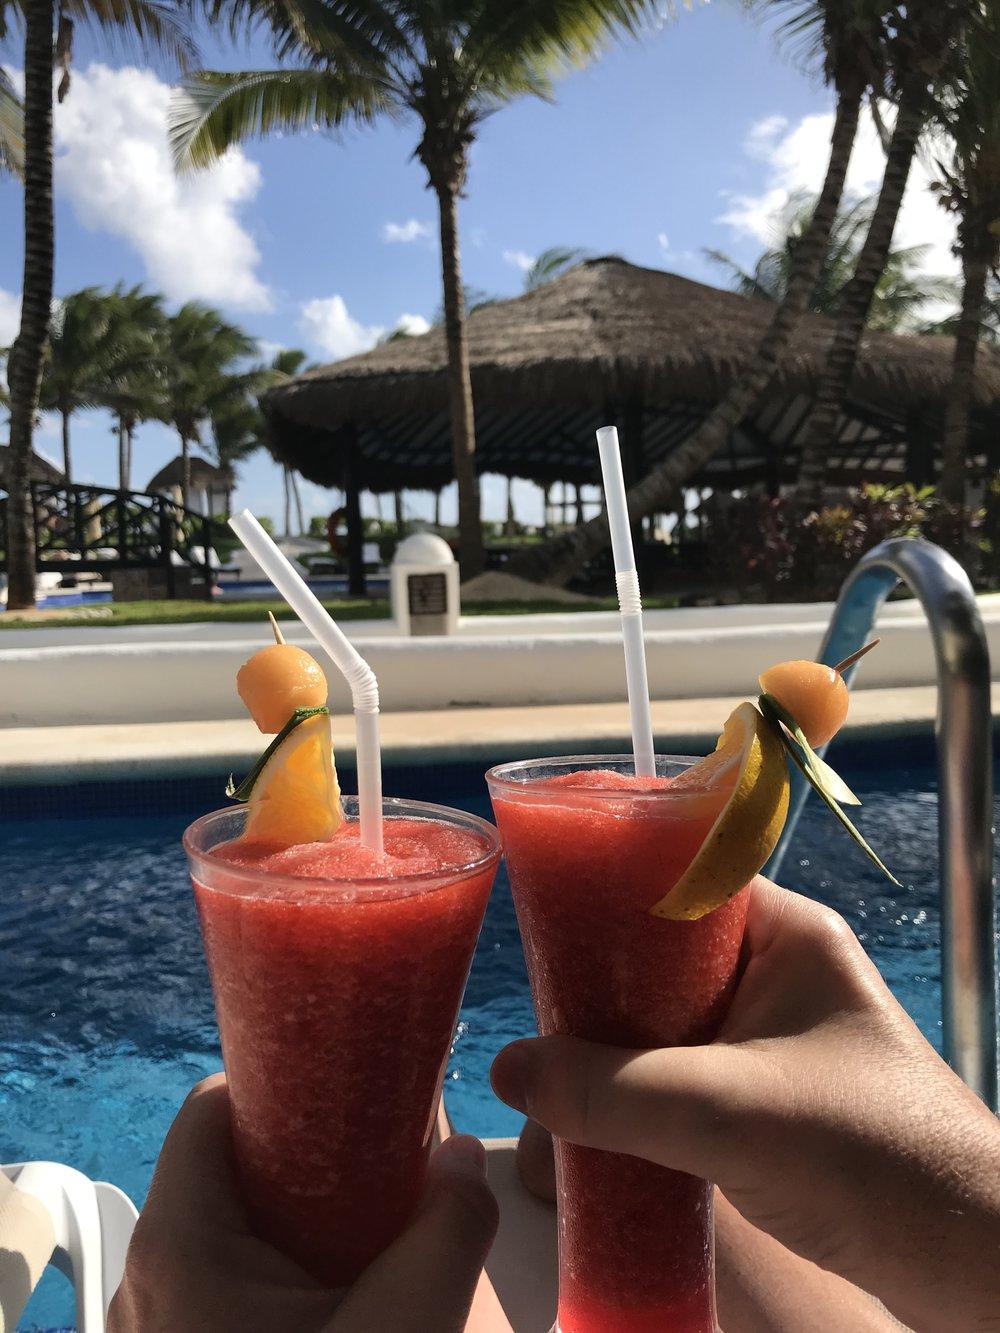 Strawberry Daquiris in our Swim Up Suite at El Dorado Casitas Royale, a Karisma Resort